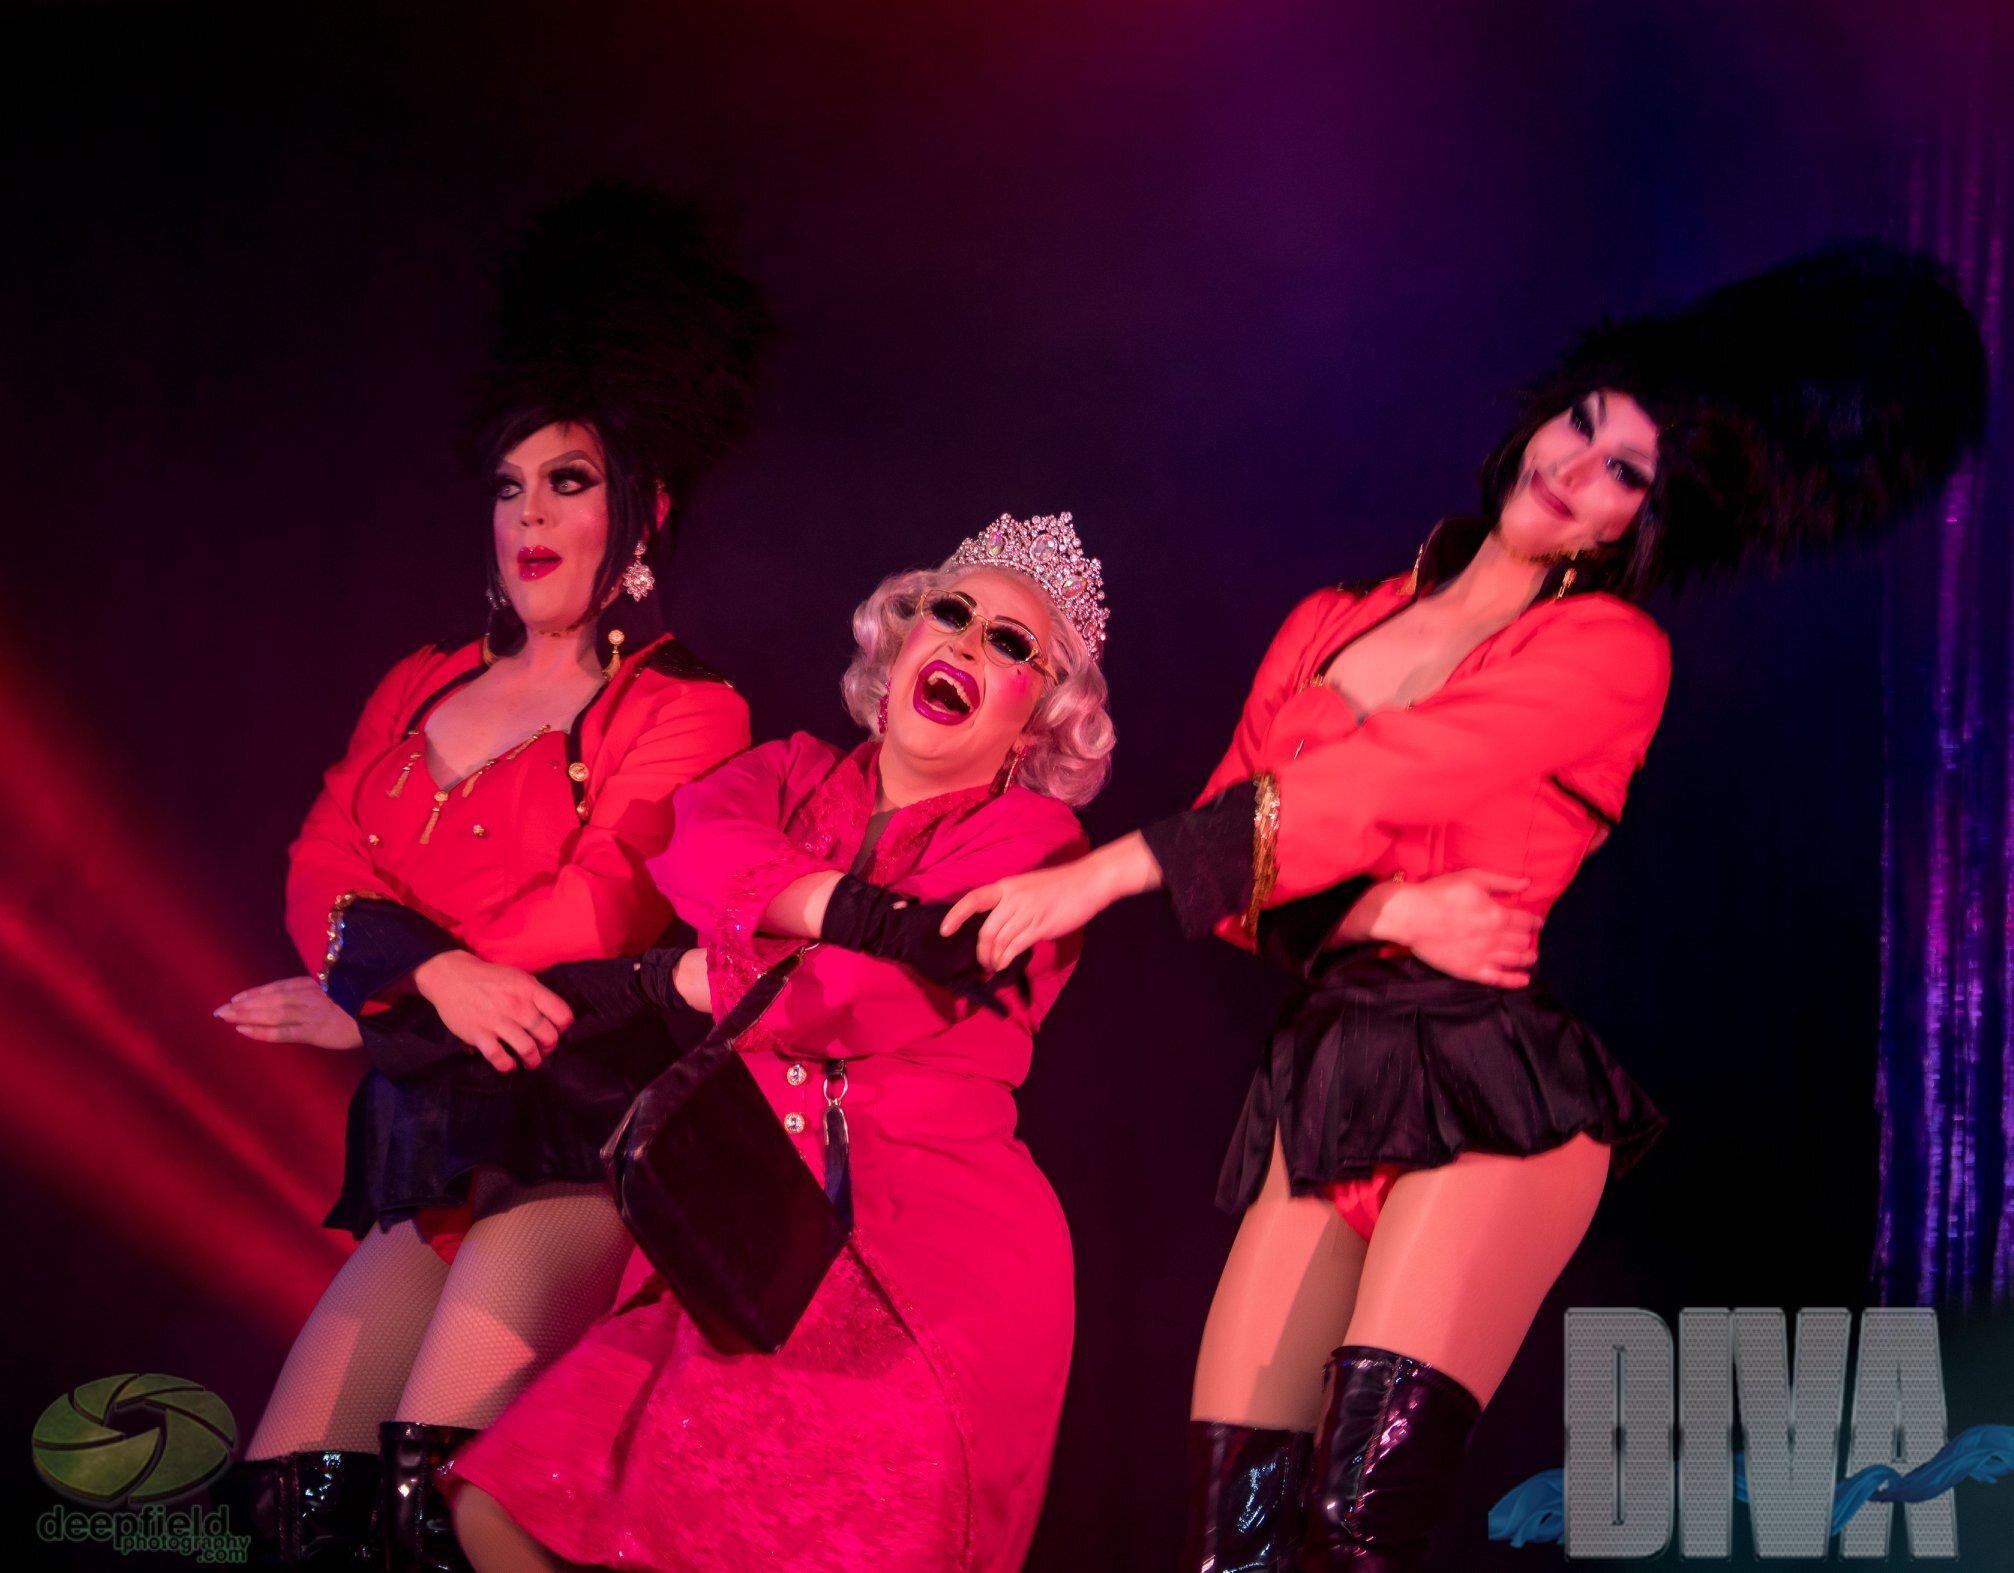 brits-n-pieces-hannah-conda-carmen-geddit-sia-tequila-diva-awards-sydney-drag-queen-royalty-best-hire-drag-race-australia-6.jpg